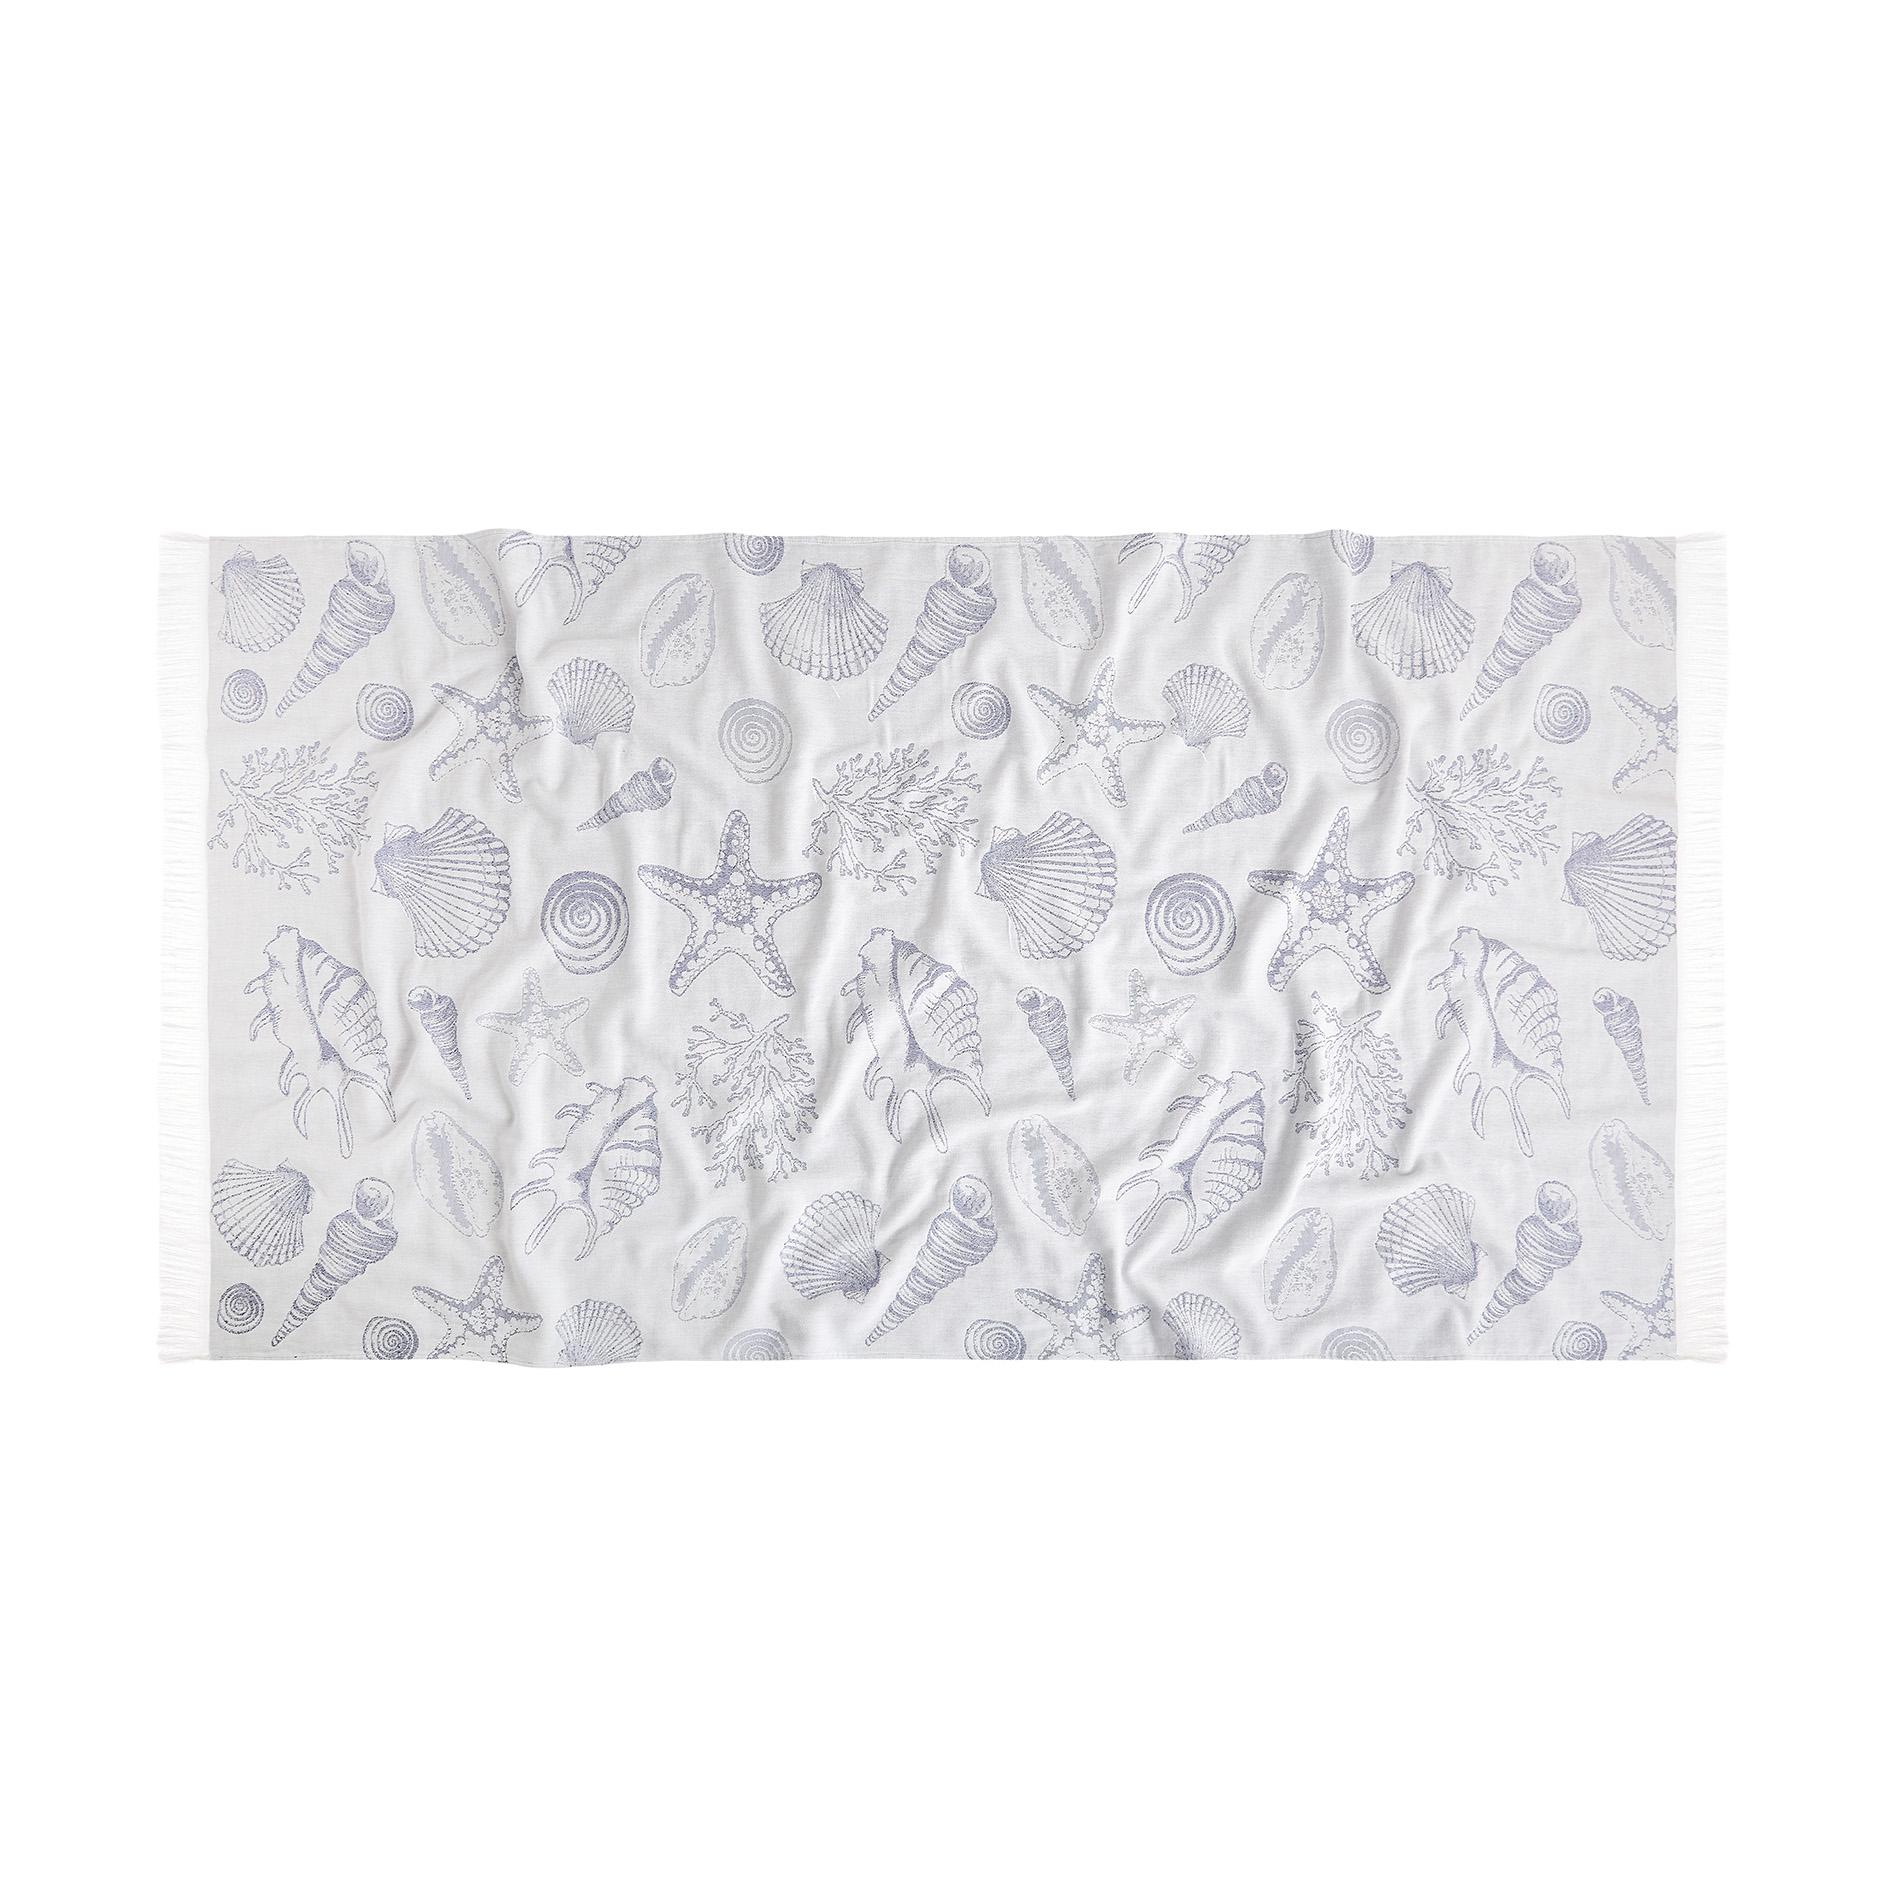 Hammam Style: 100% Cotton Hammam-style Shell Beach Towel